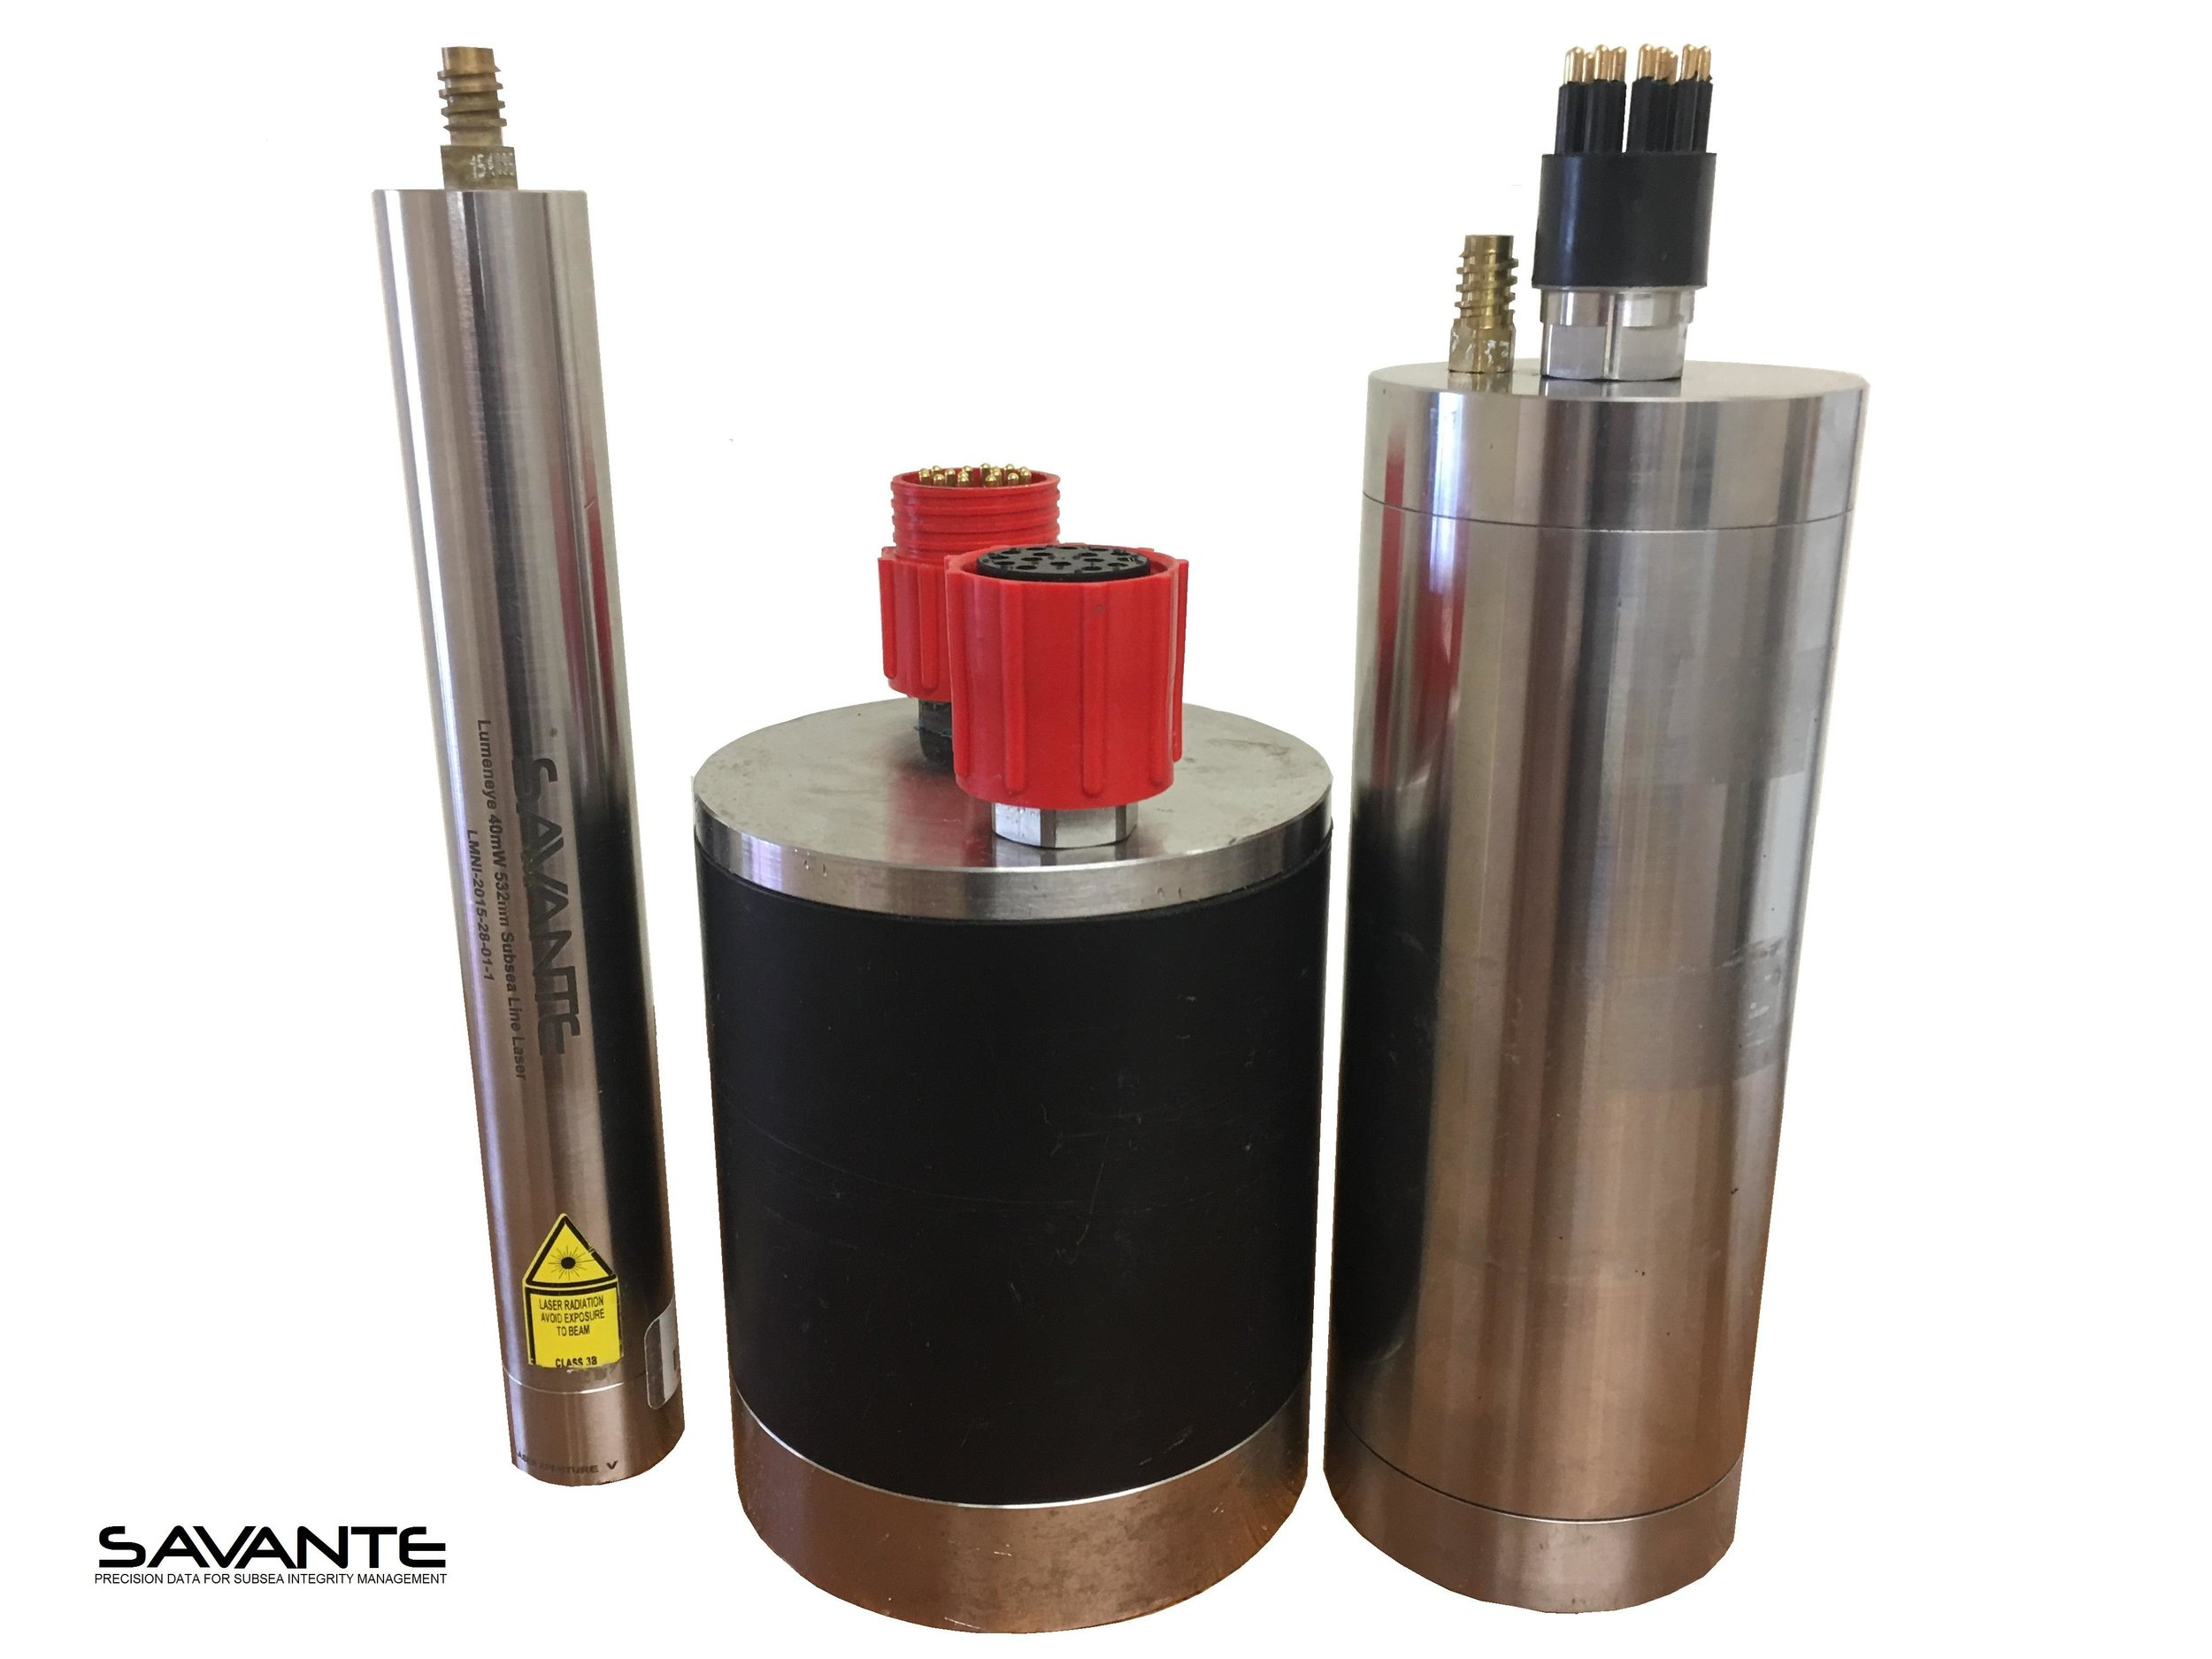 Savante's SLV-80 subsea laser profiler and AUV integration kit